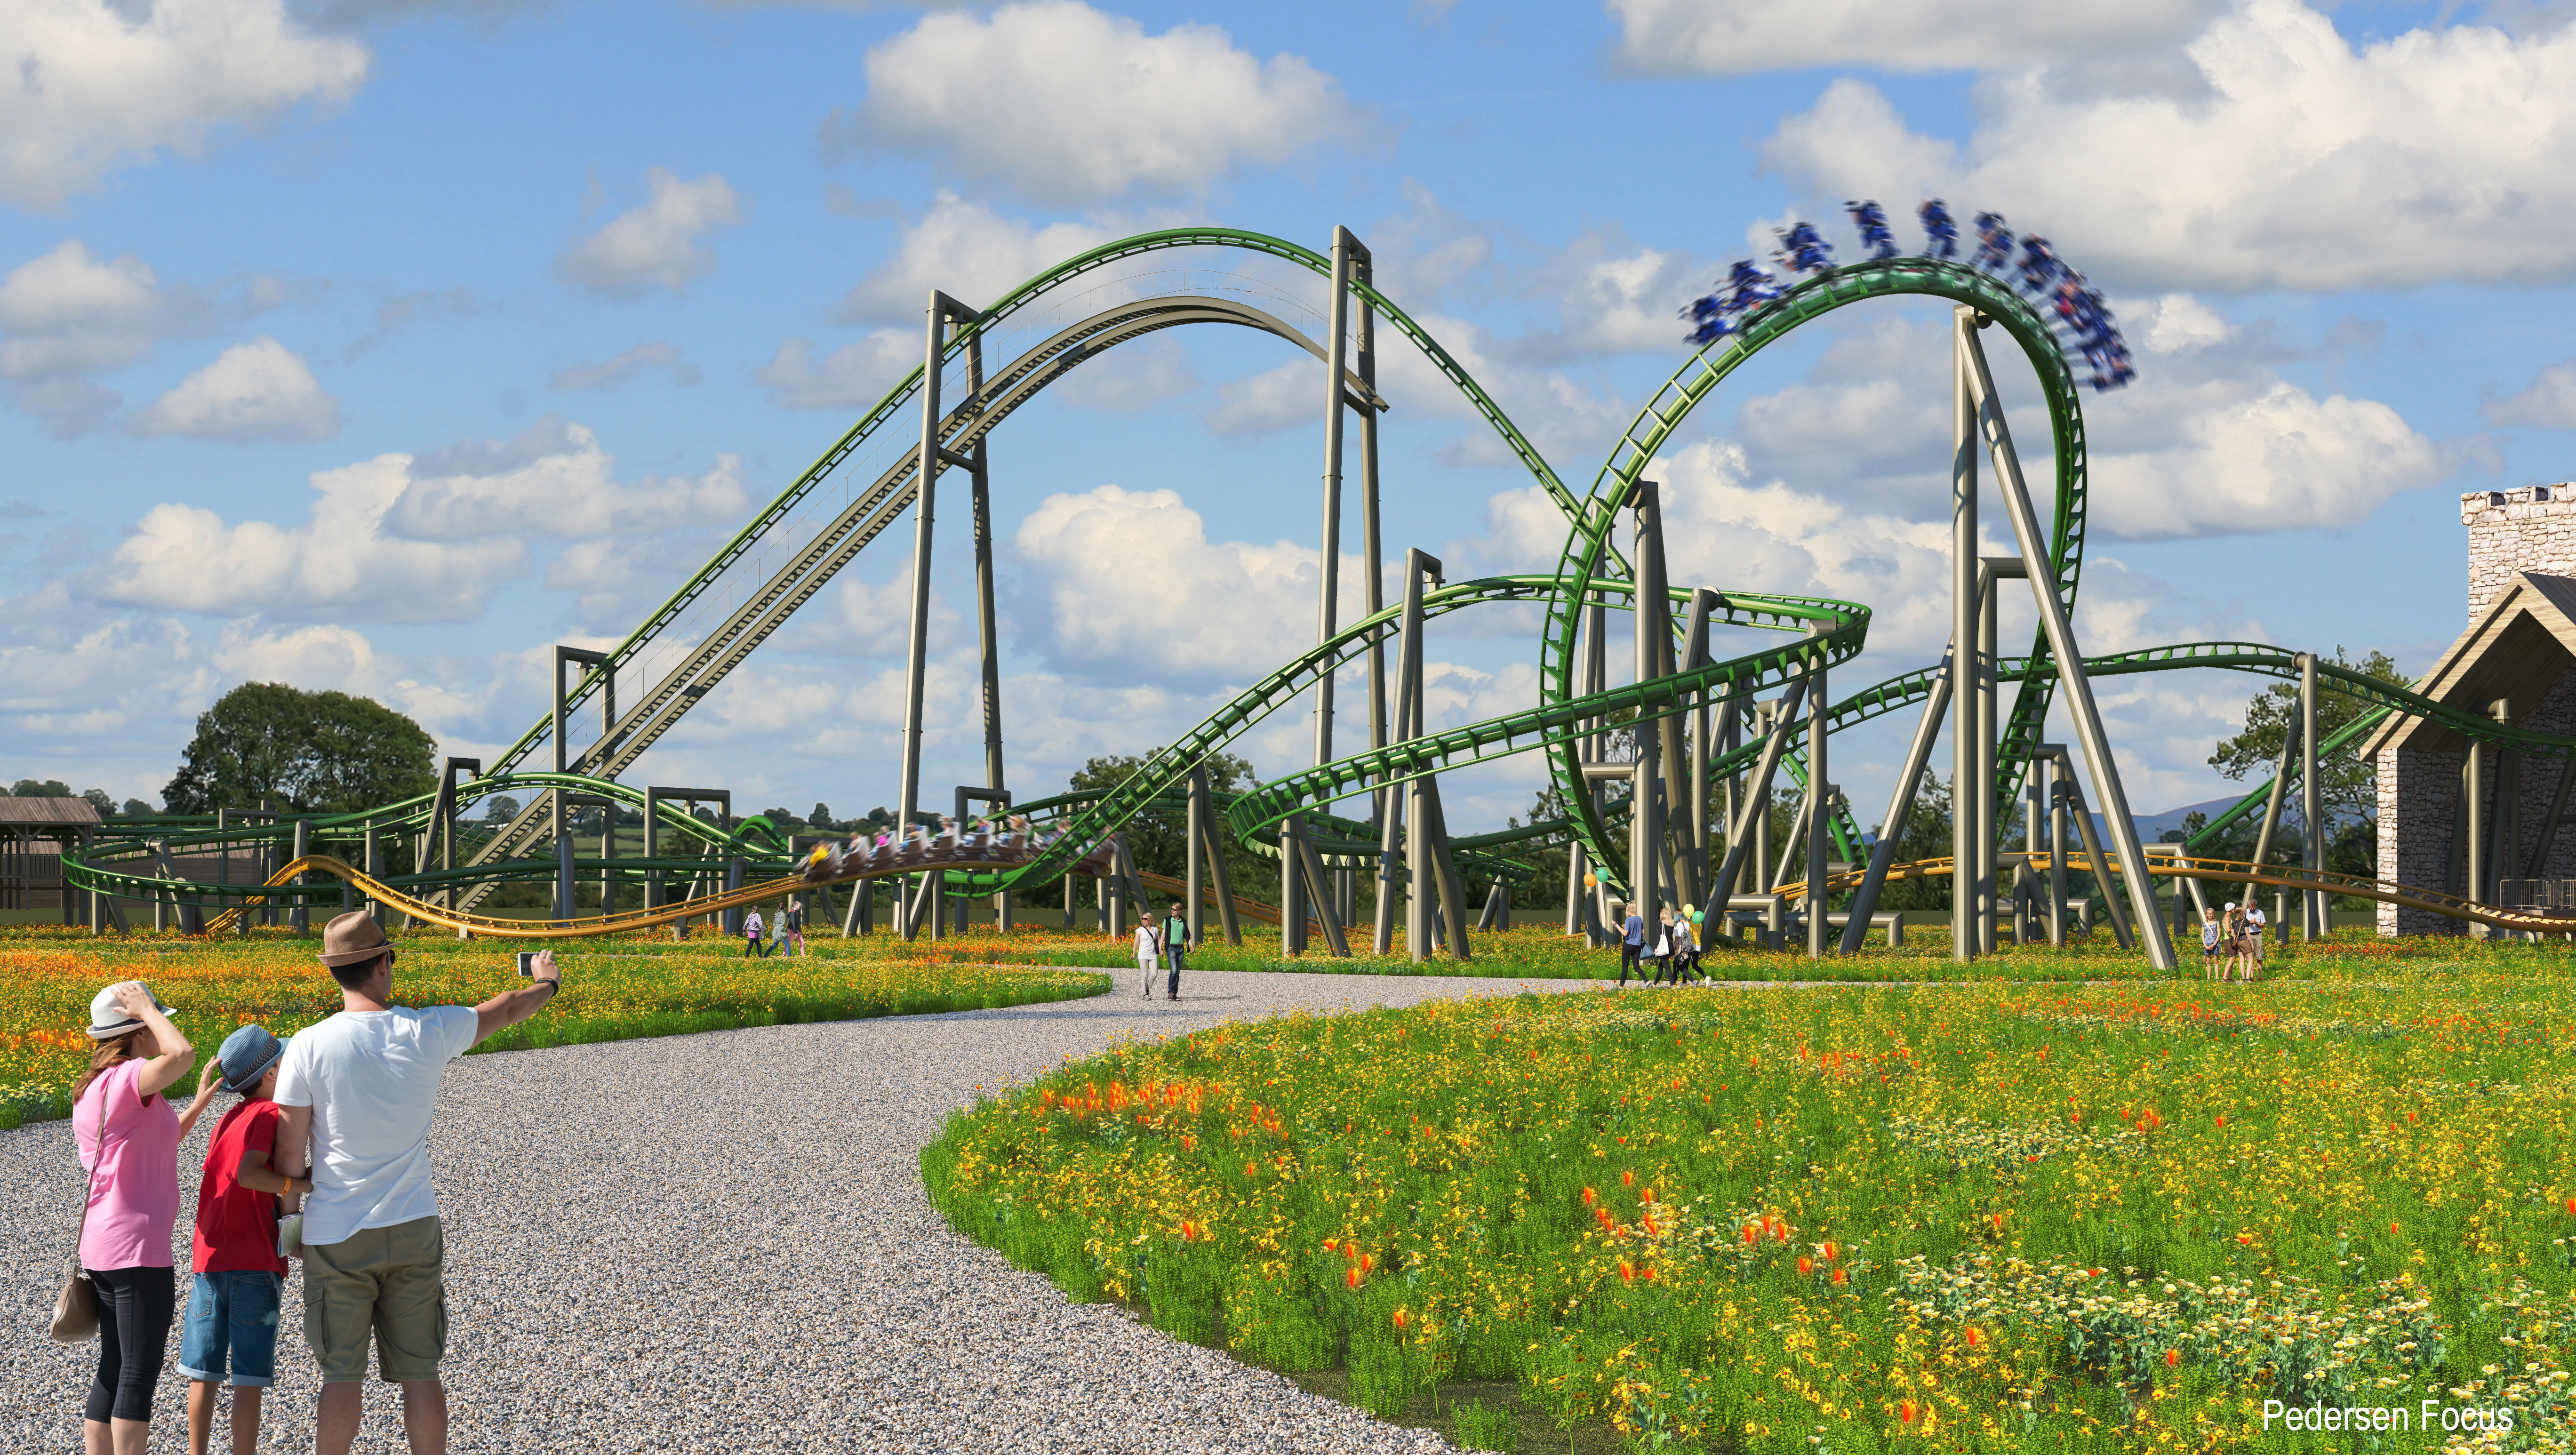 3d artist's impression of Tayto Park Rollercoaster